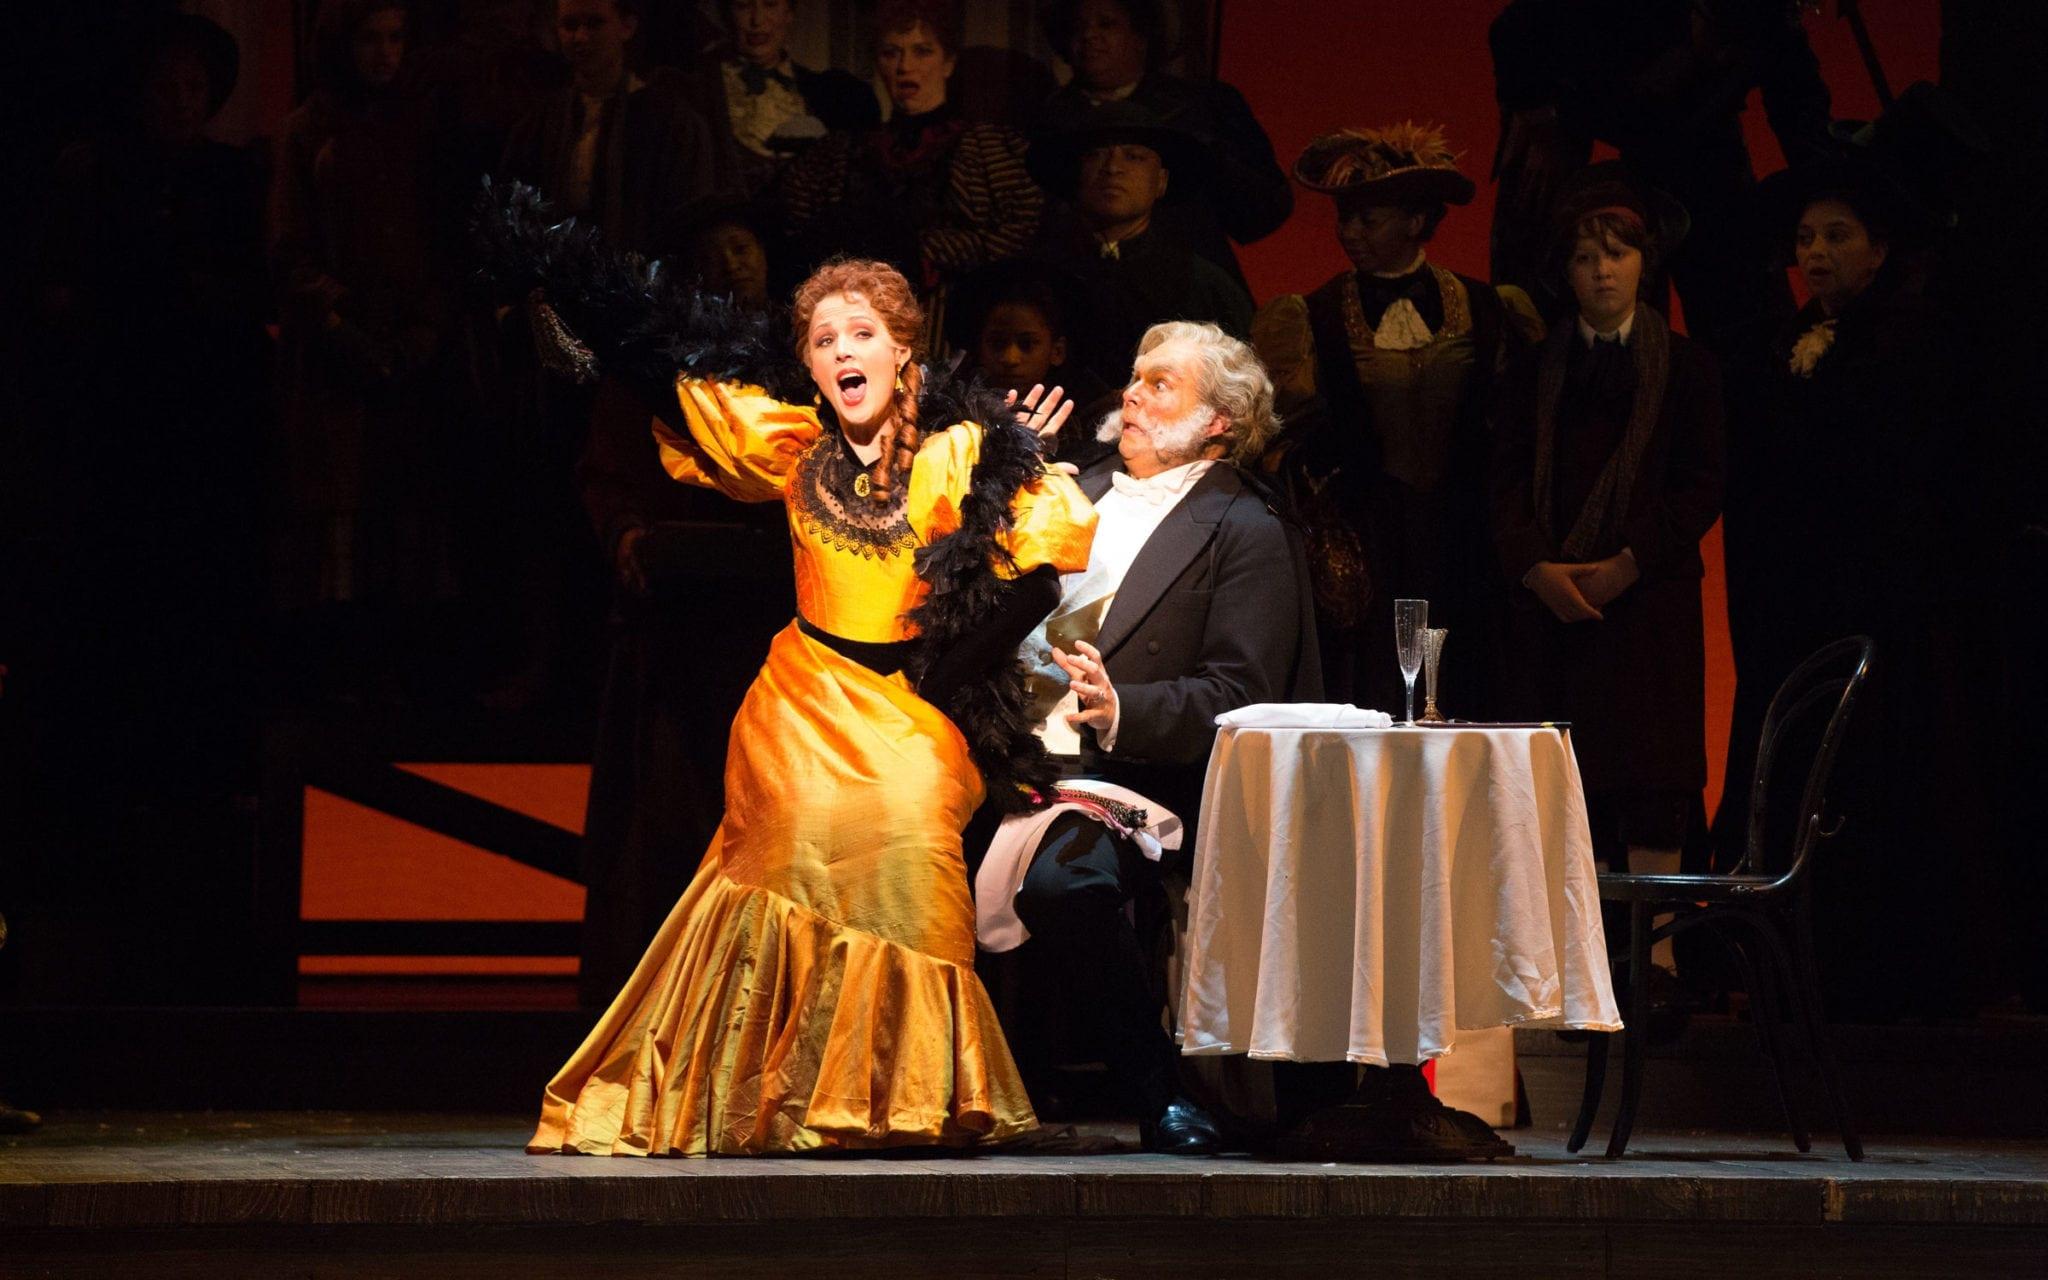 Leah Partridge's Musetta (shown Alan Higgs) is a scene stealer.